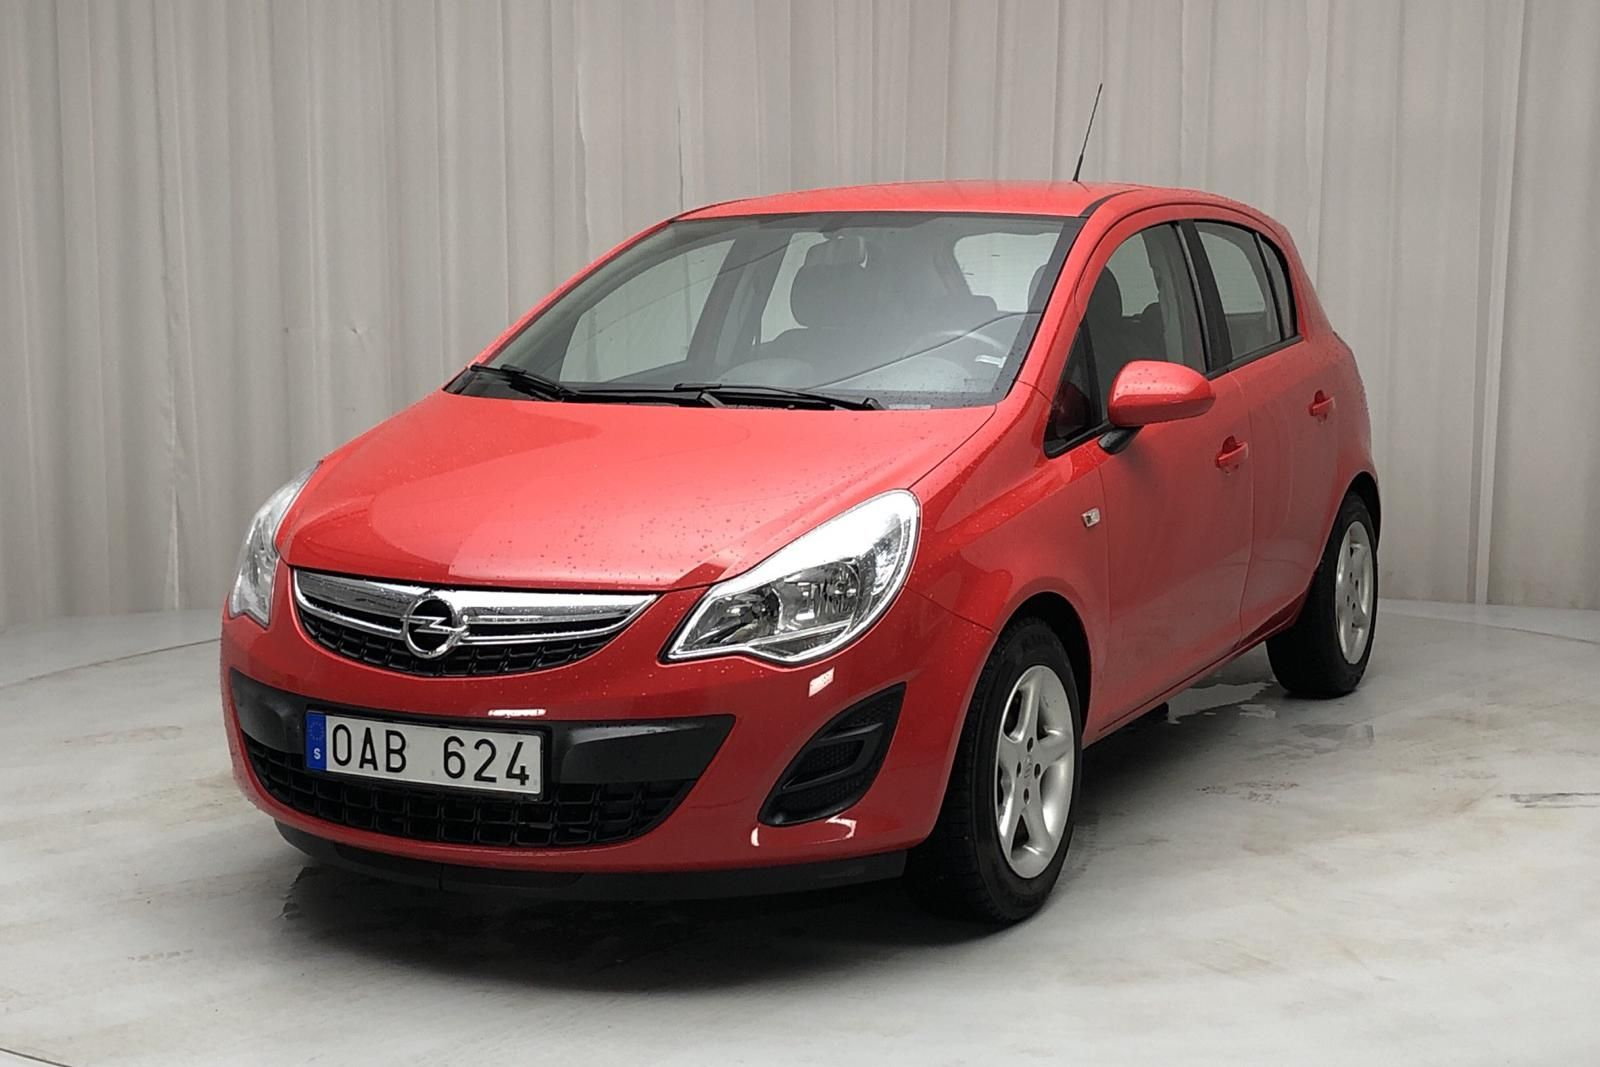 Opel Corsa 1.2 Twinport 5dr (85hk)